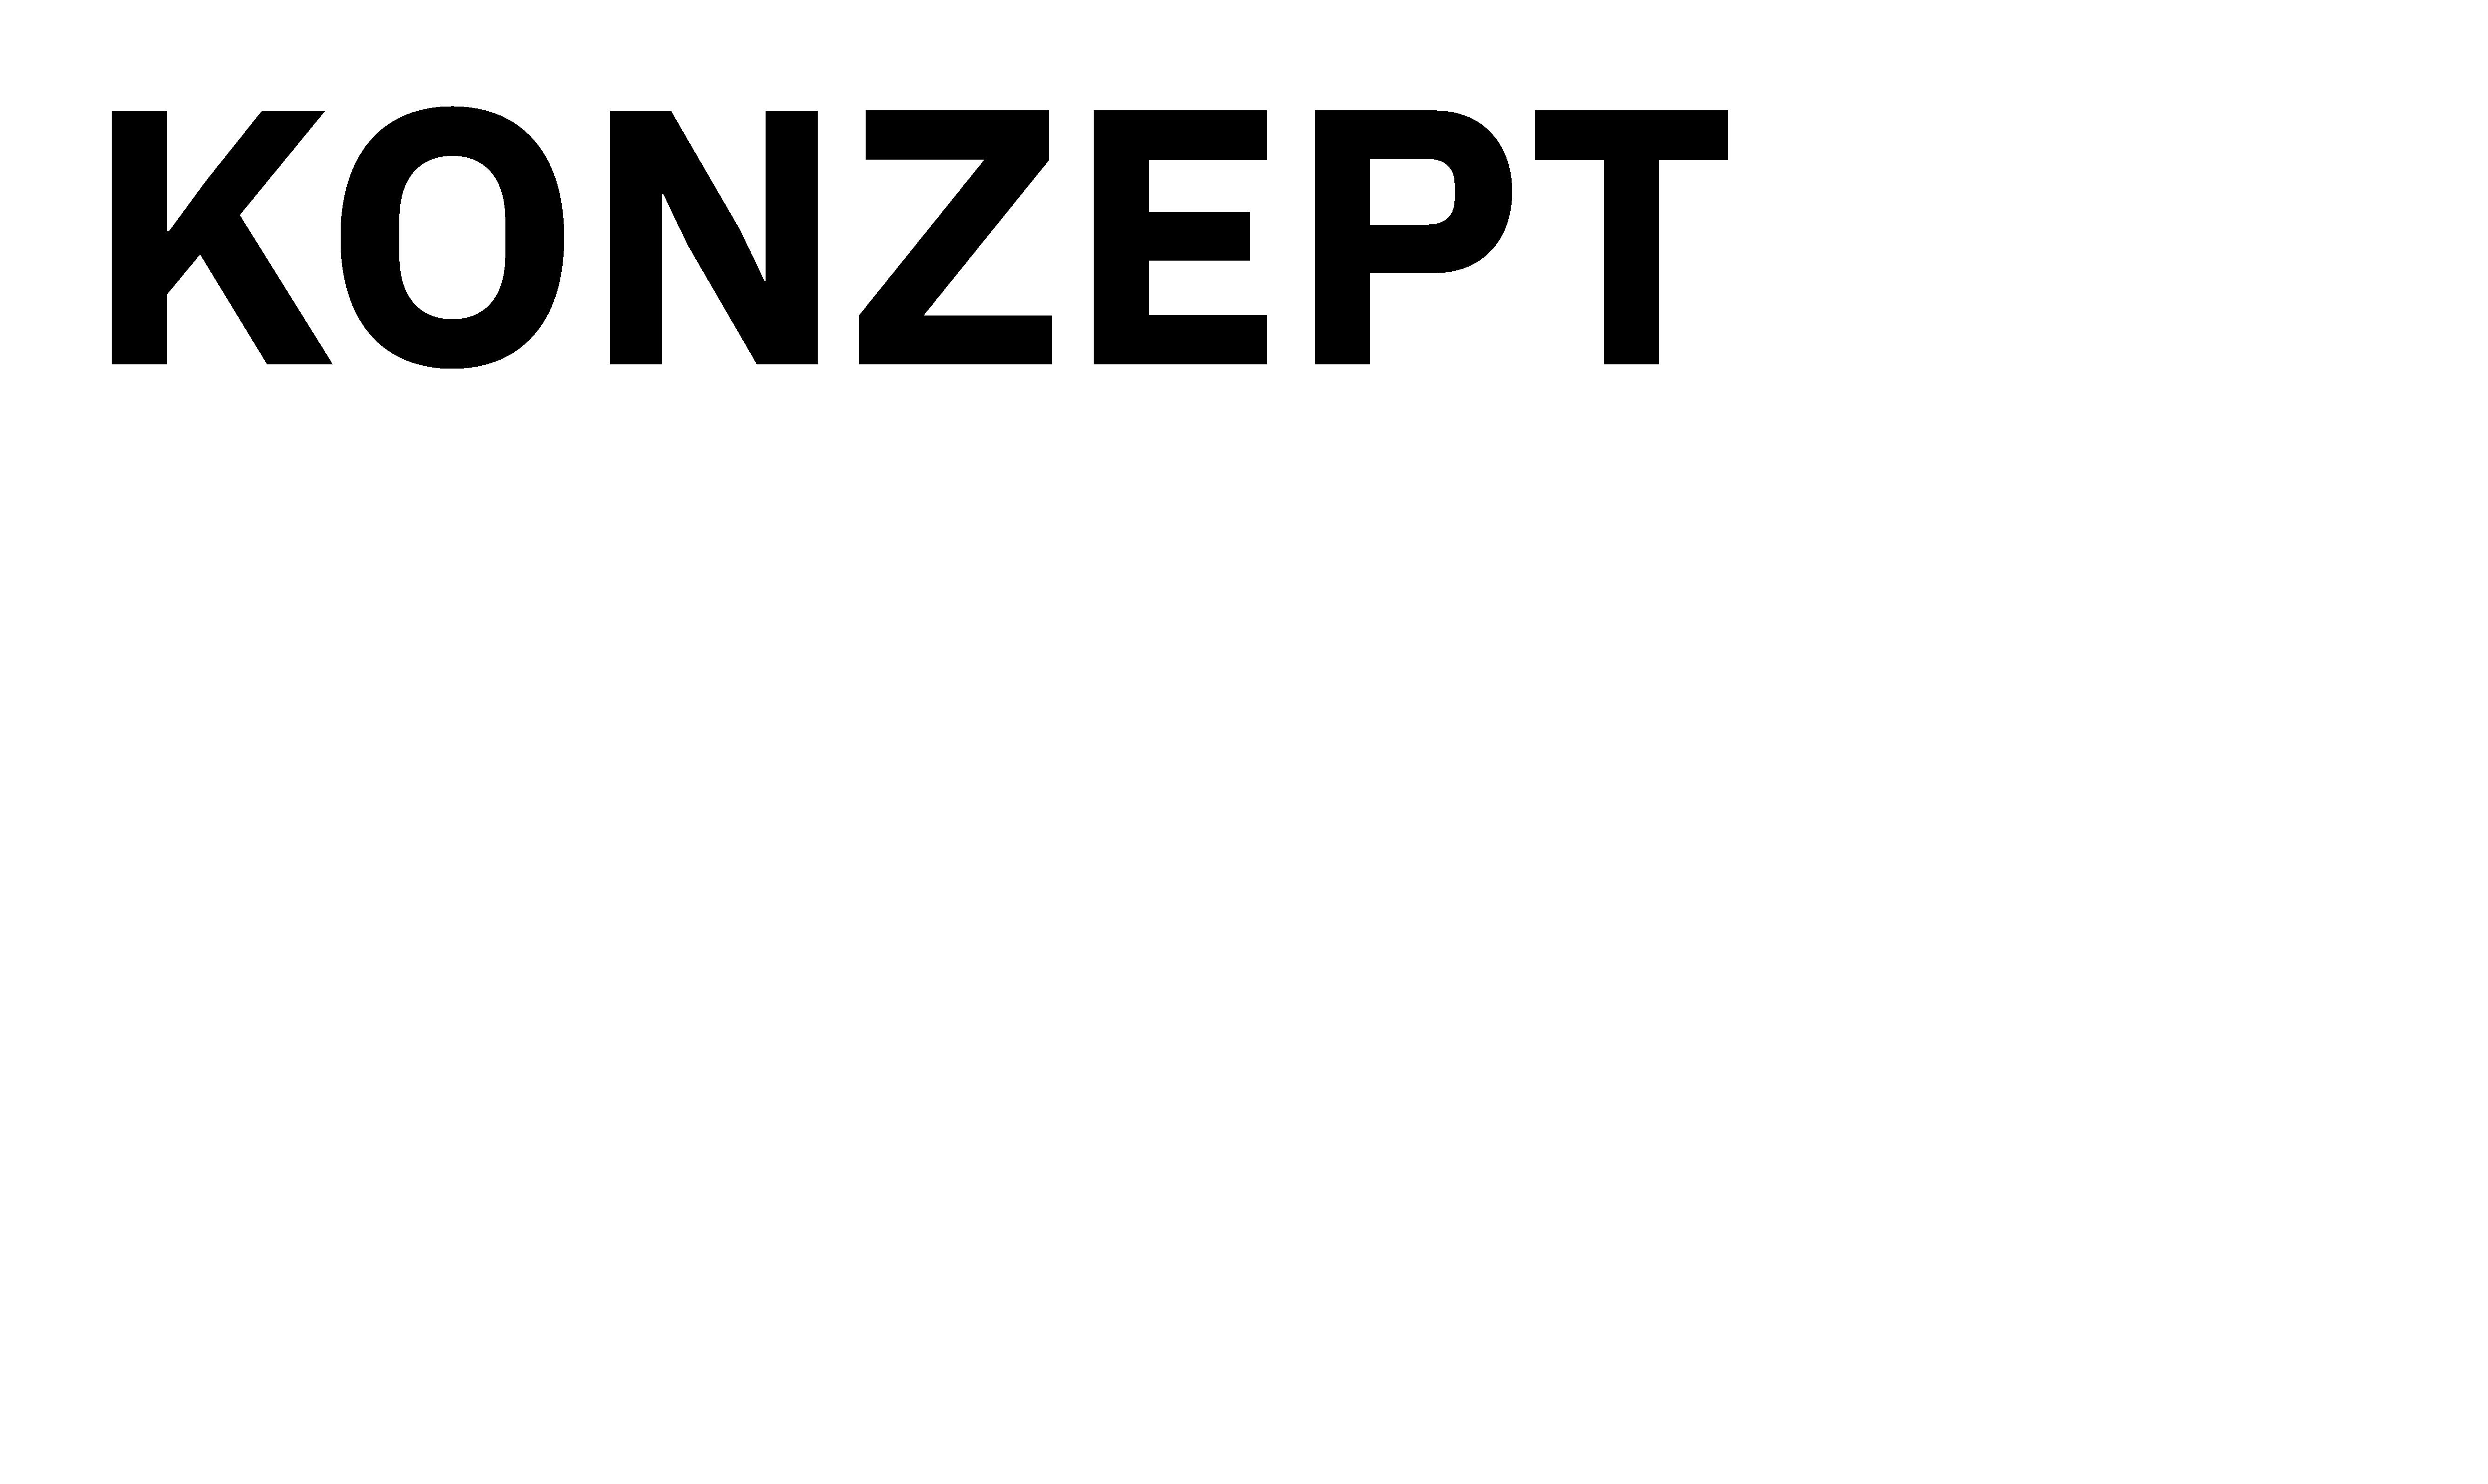 KONZEPT-09